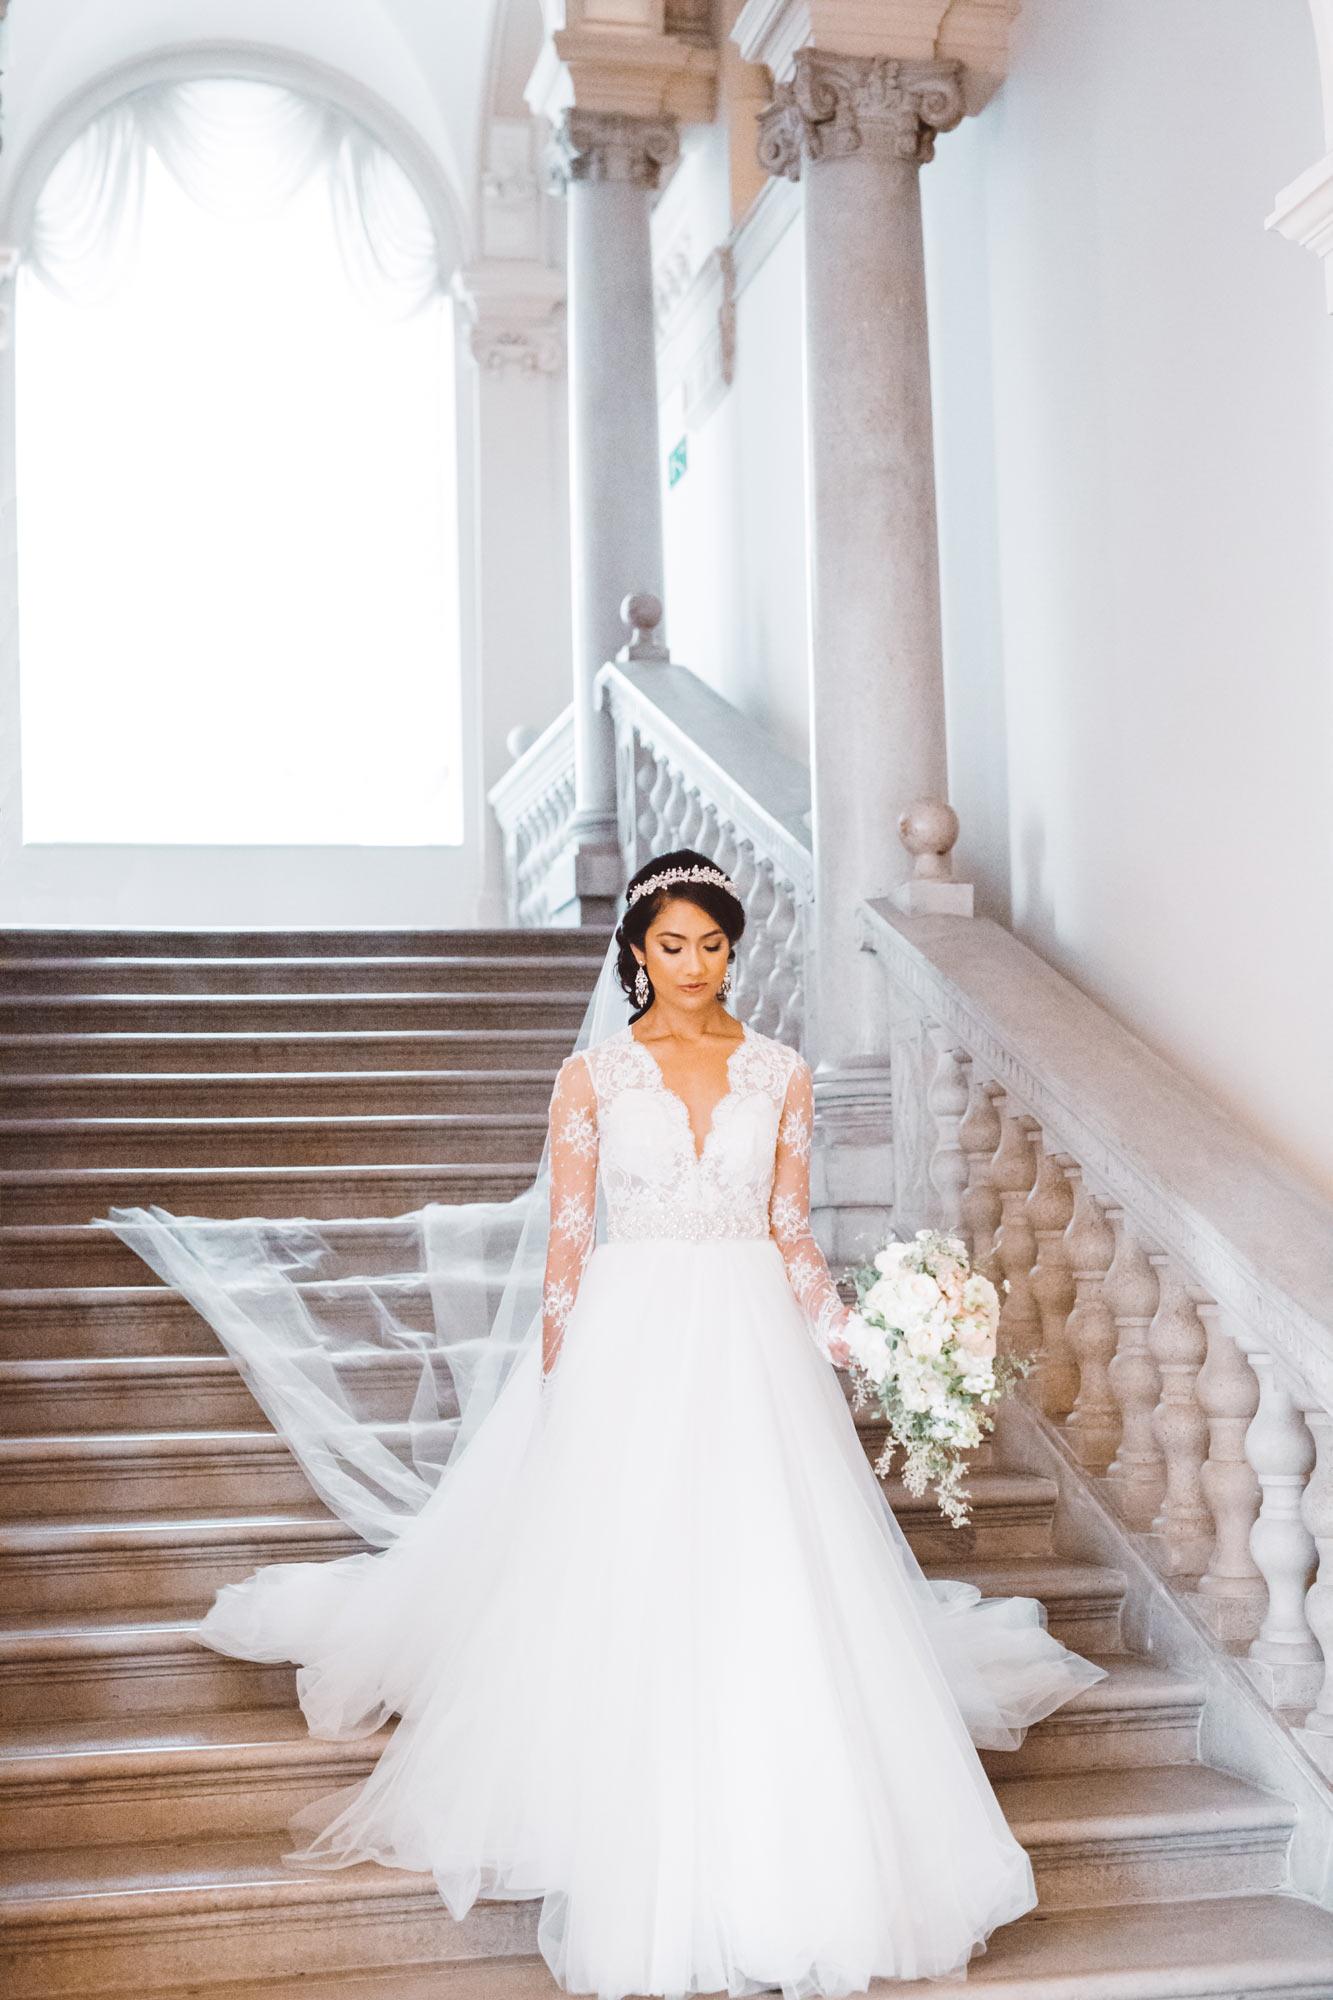 BeckyLee-wedding4.jpg